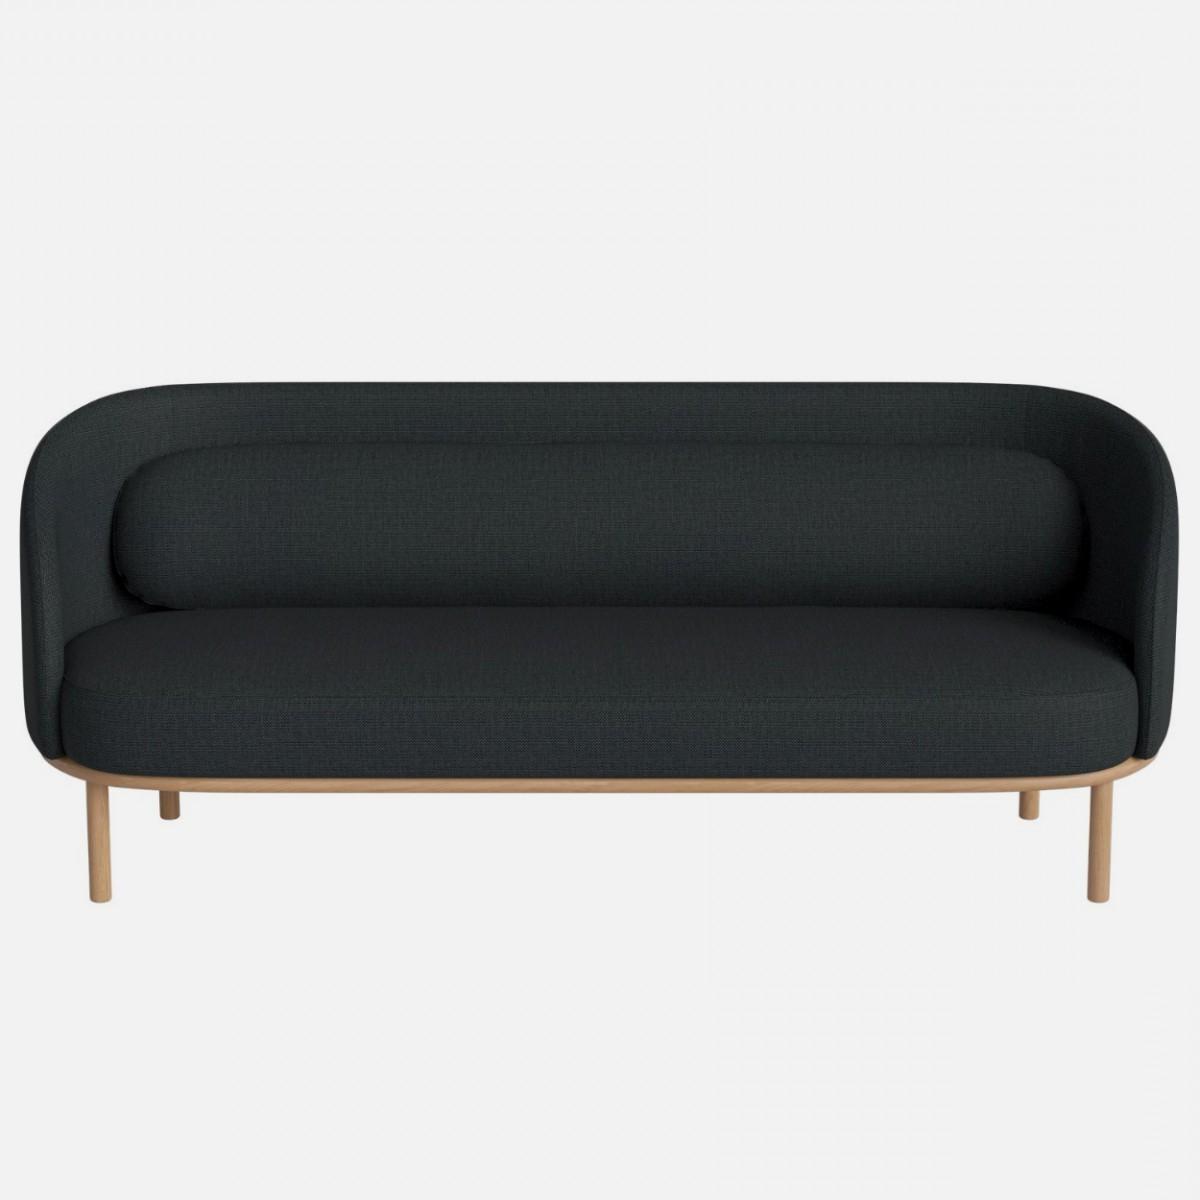 Latest London Dark Grey Sofa Chairs Within Fuuga Sofa 3 Seats London/dark Grey – Bolia (View 9 of 20)